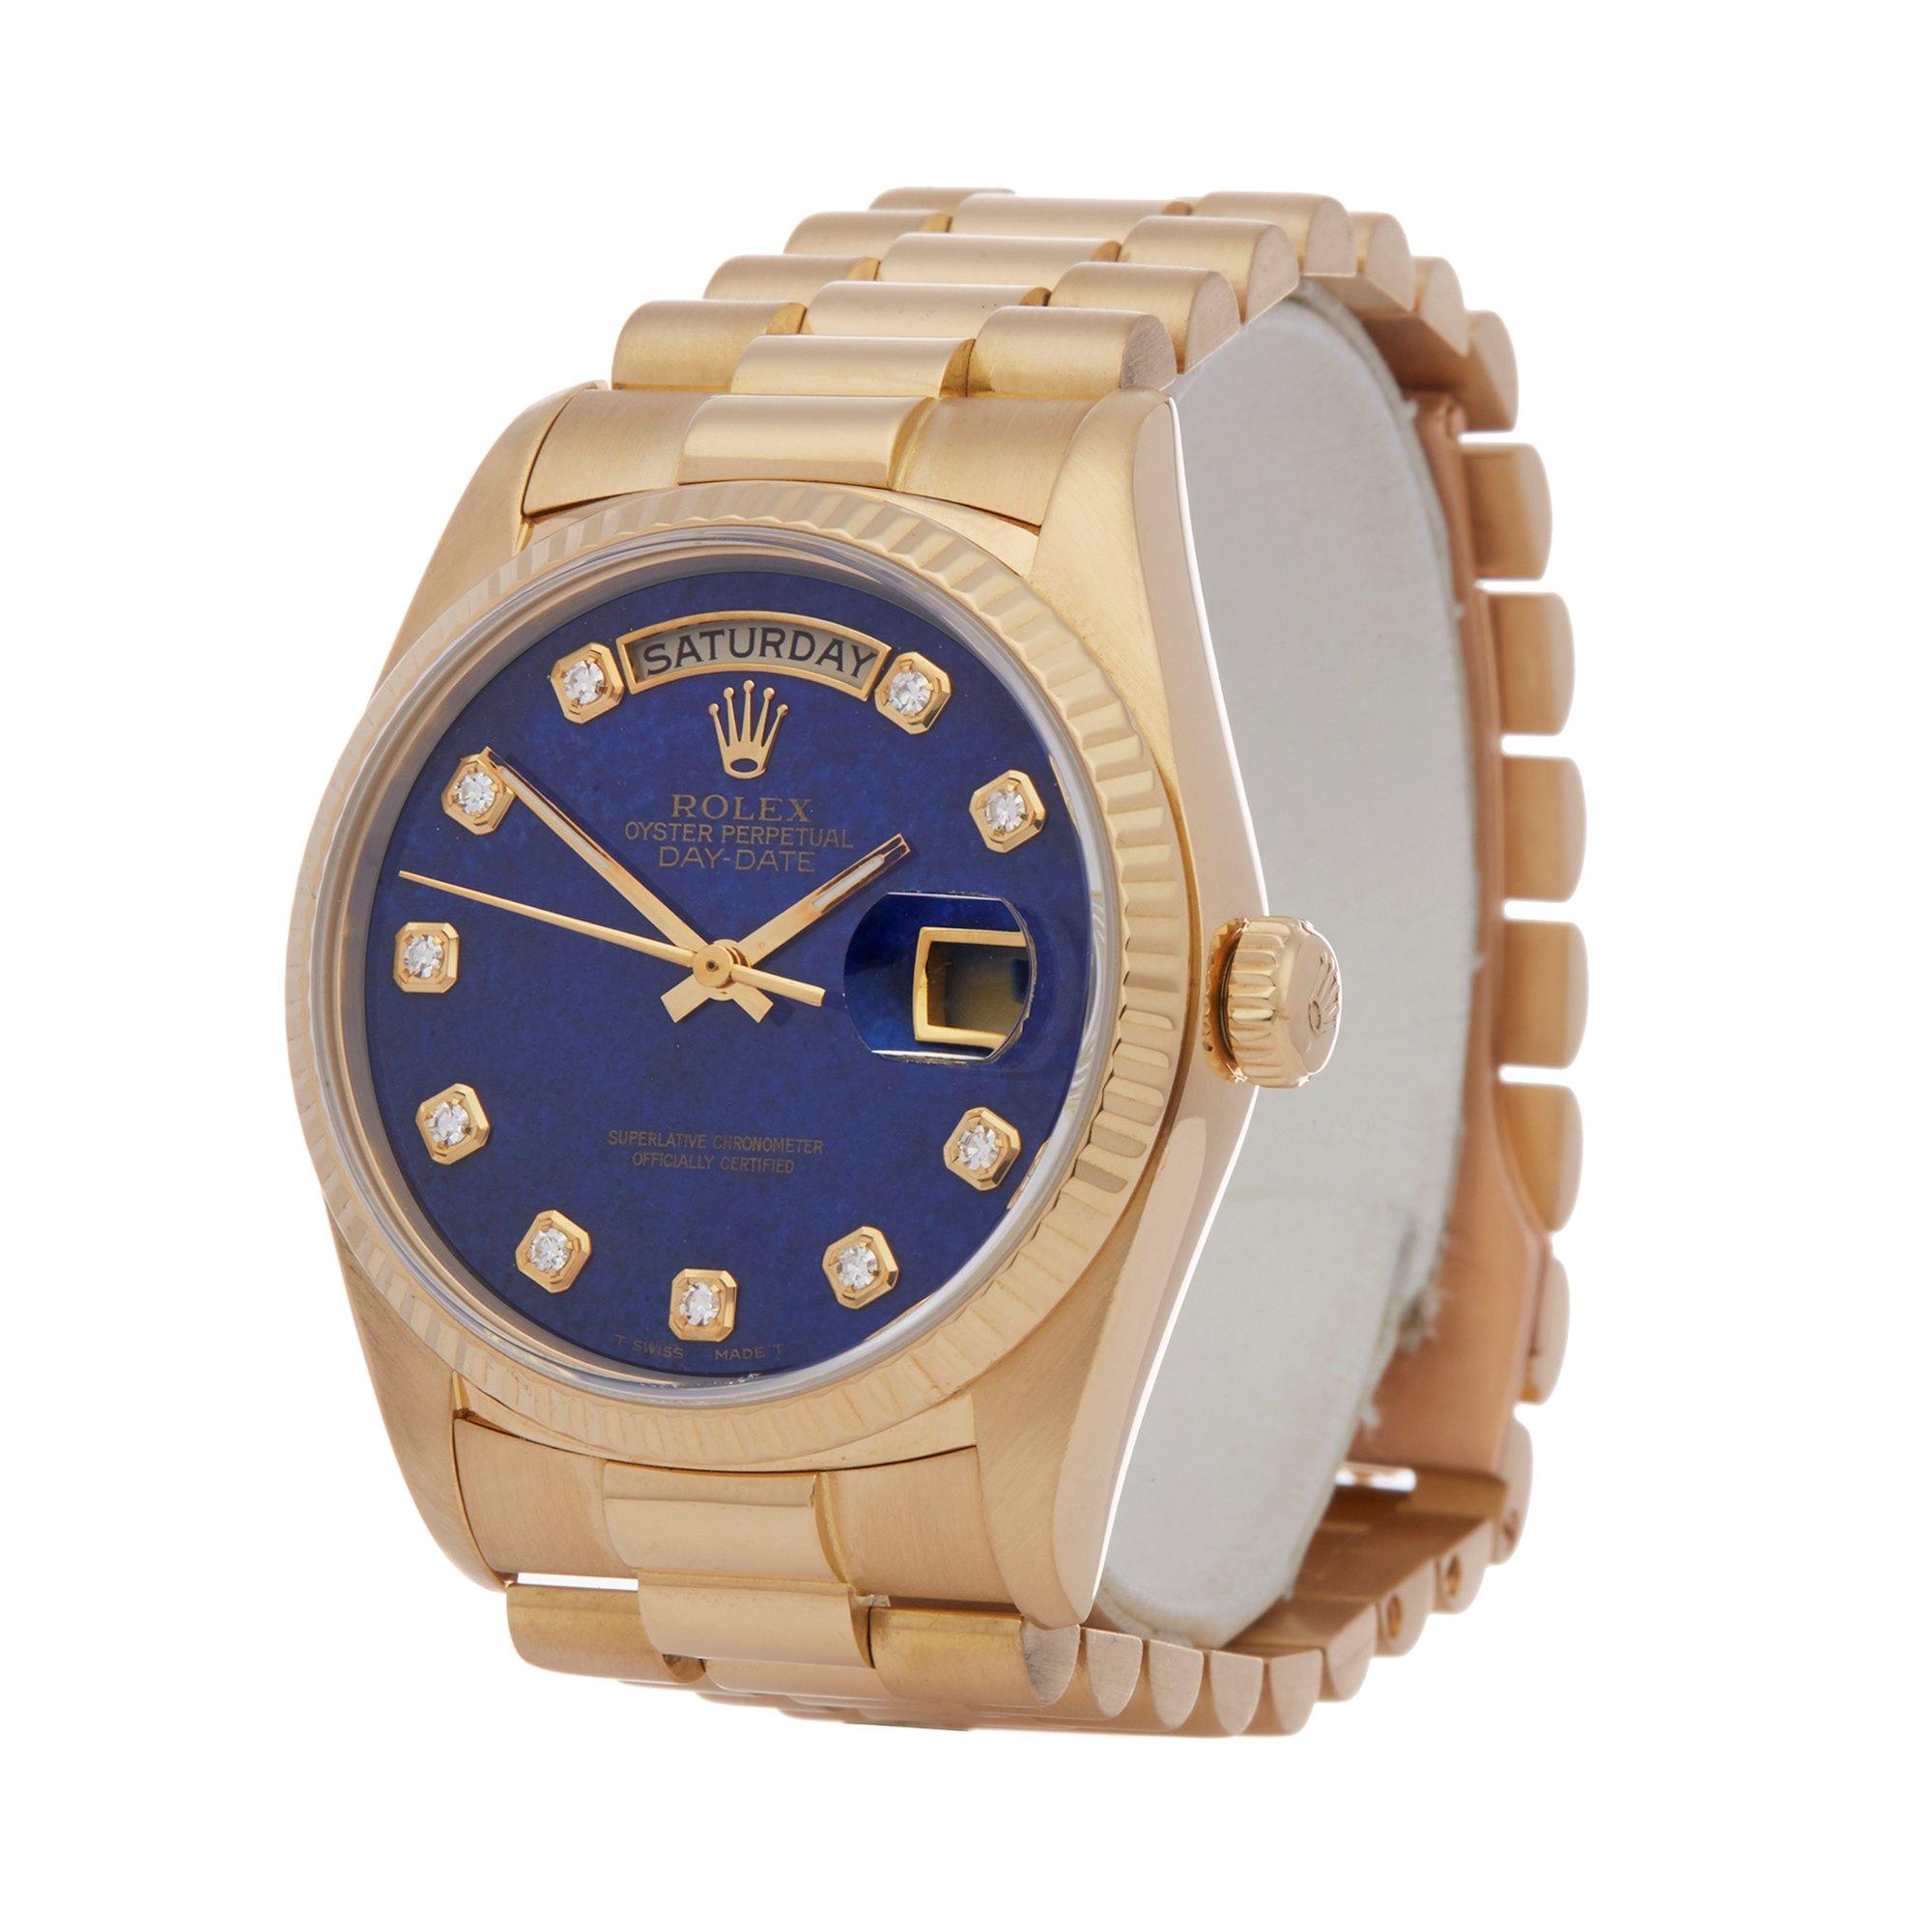 Rolex Day-Date 36 Lapis Lazuli Diamond 18K Yellow Gold 18038